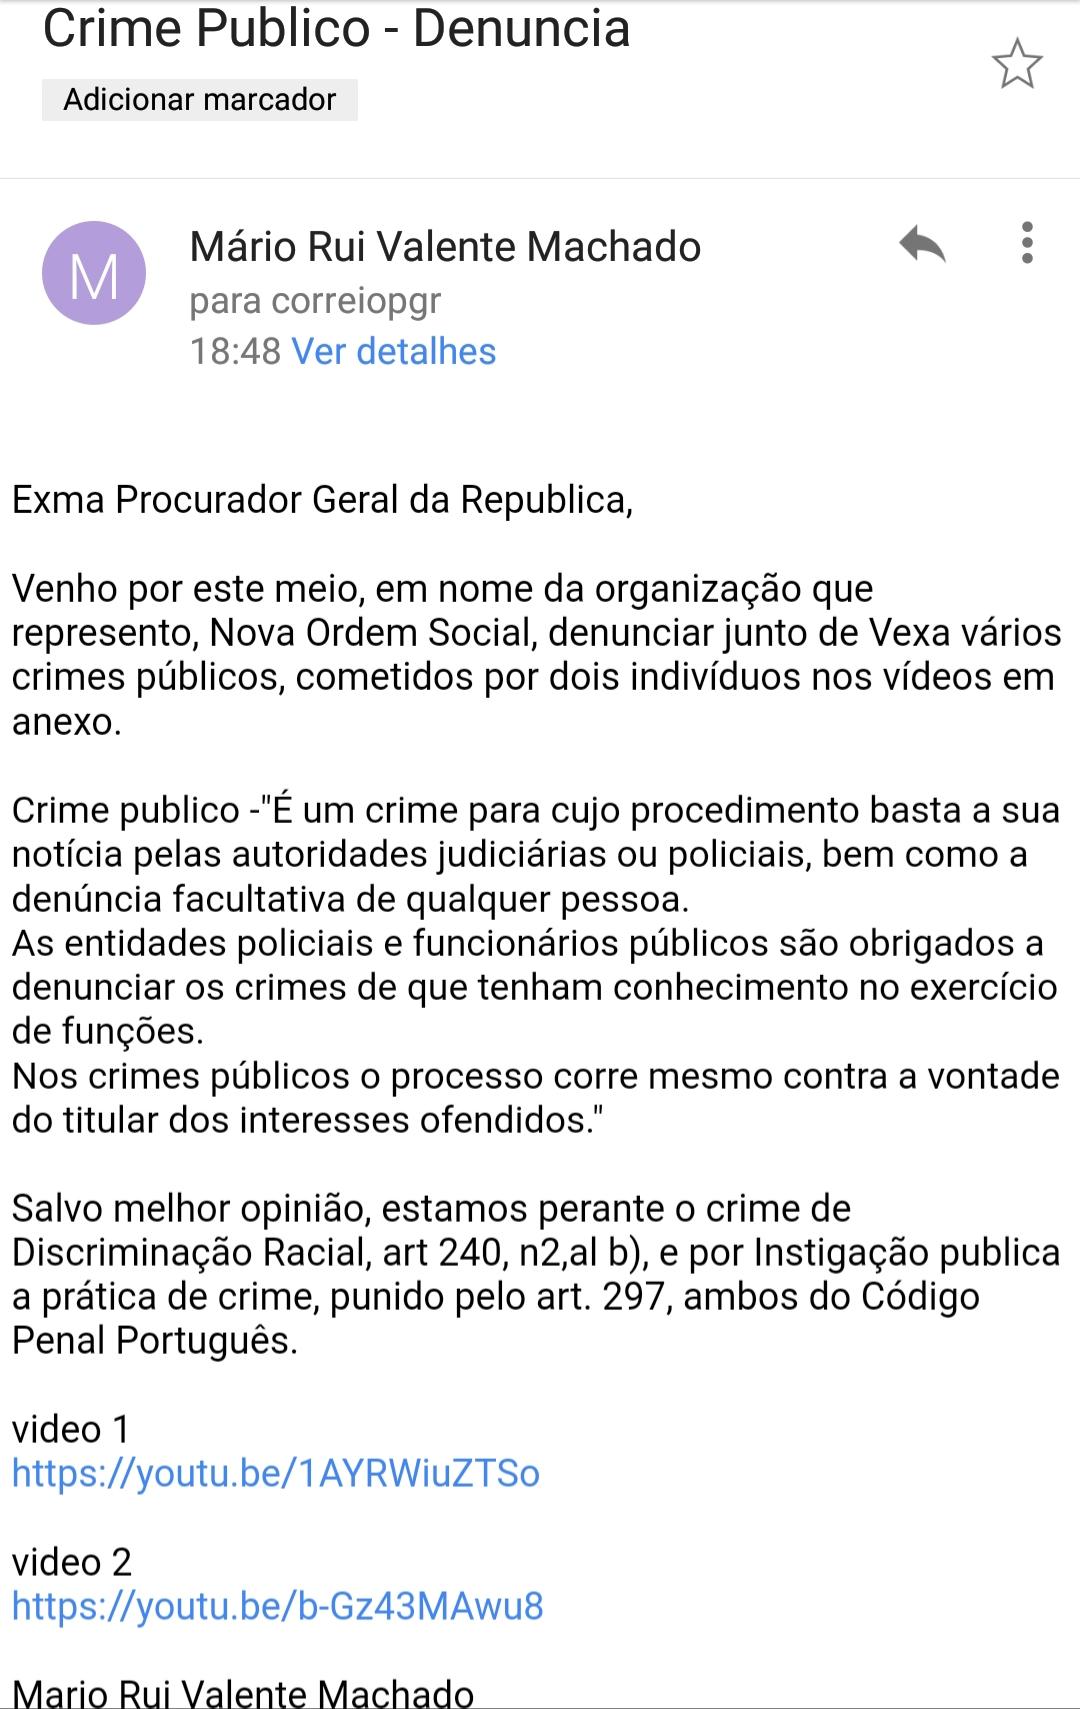 Nova Ordem Social - Apresenta queixa crime contra negros racistas  20190117